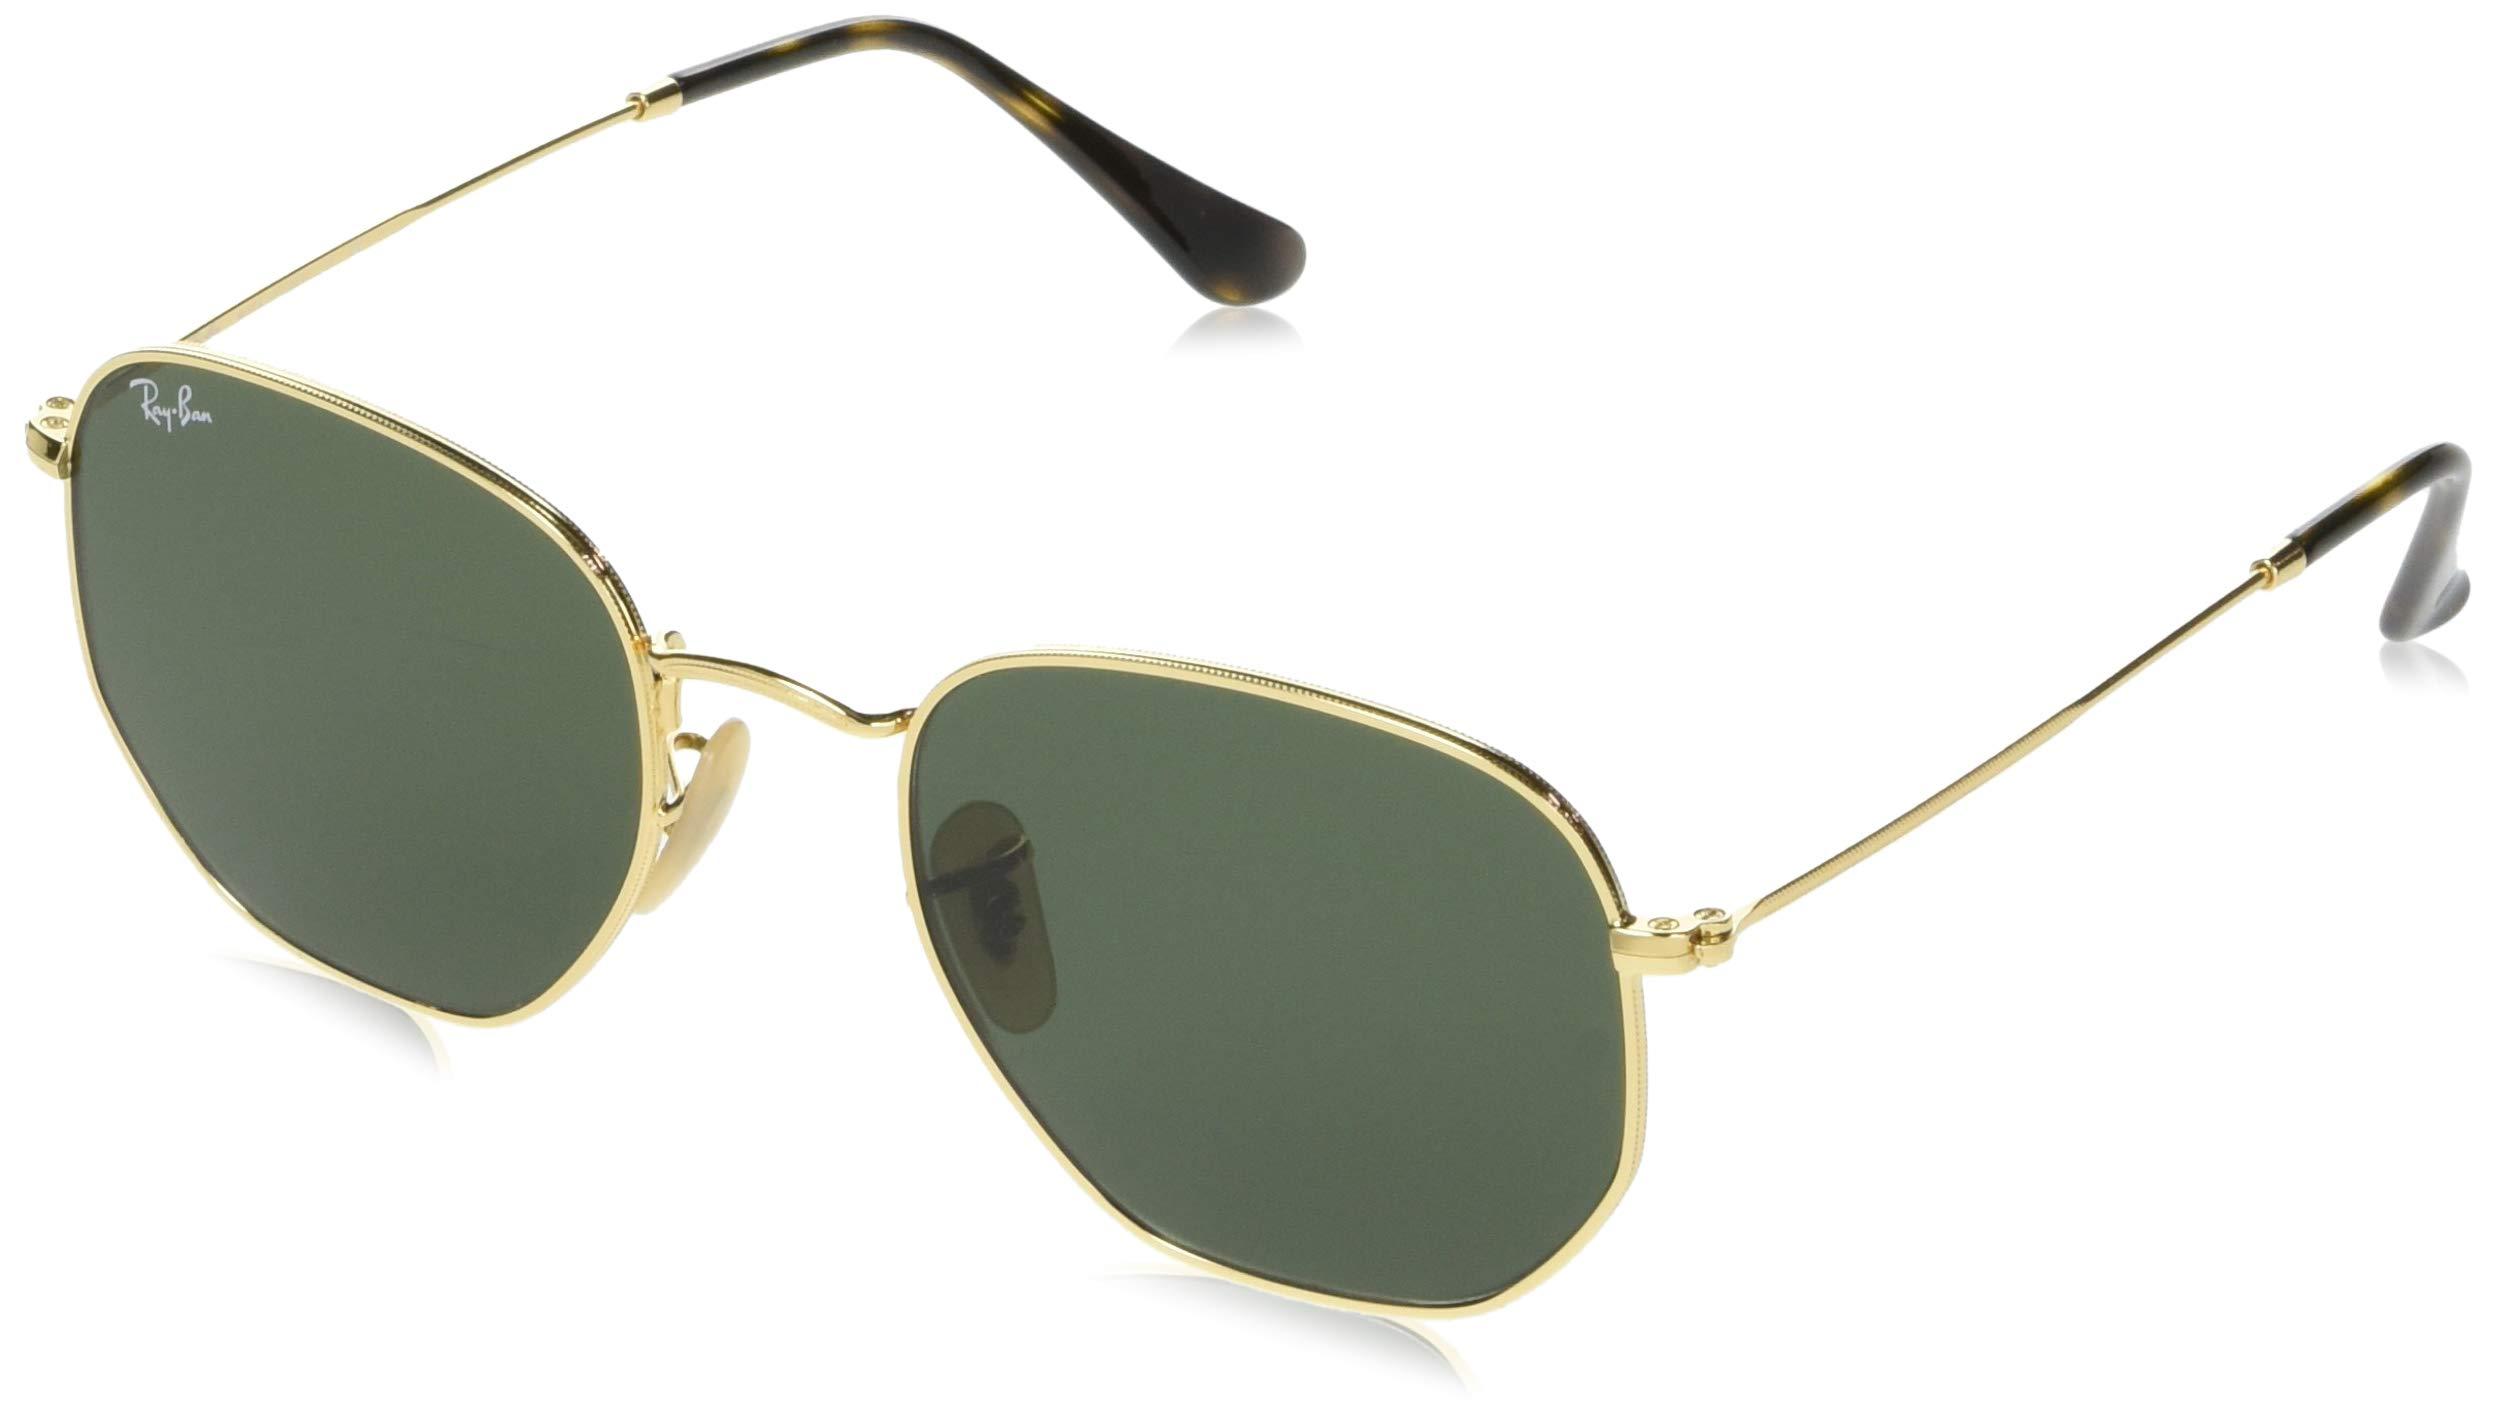 Ray-Ban RB3548N Hexagonal Flat Lenses Sunglasses, Gold/Green, 54 mm